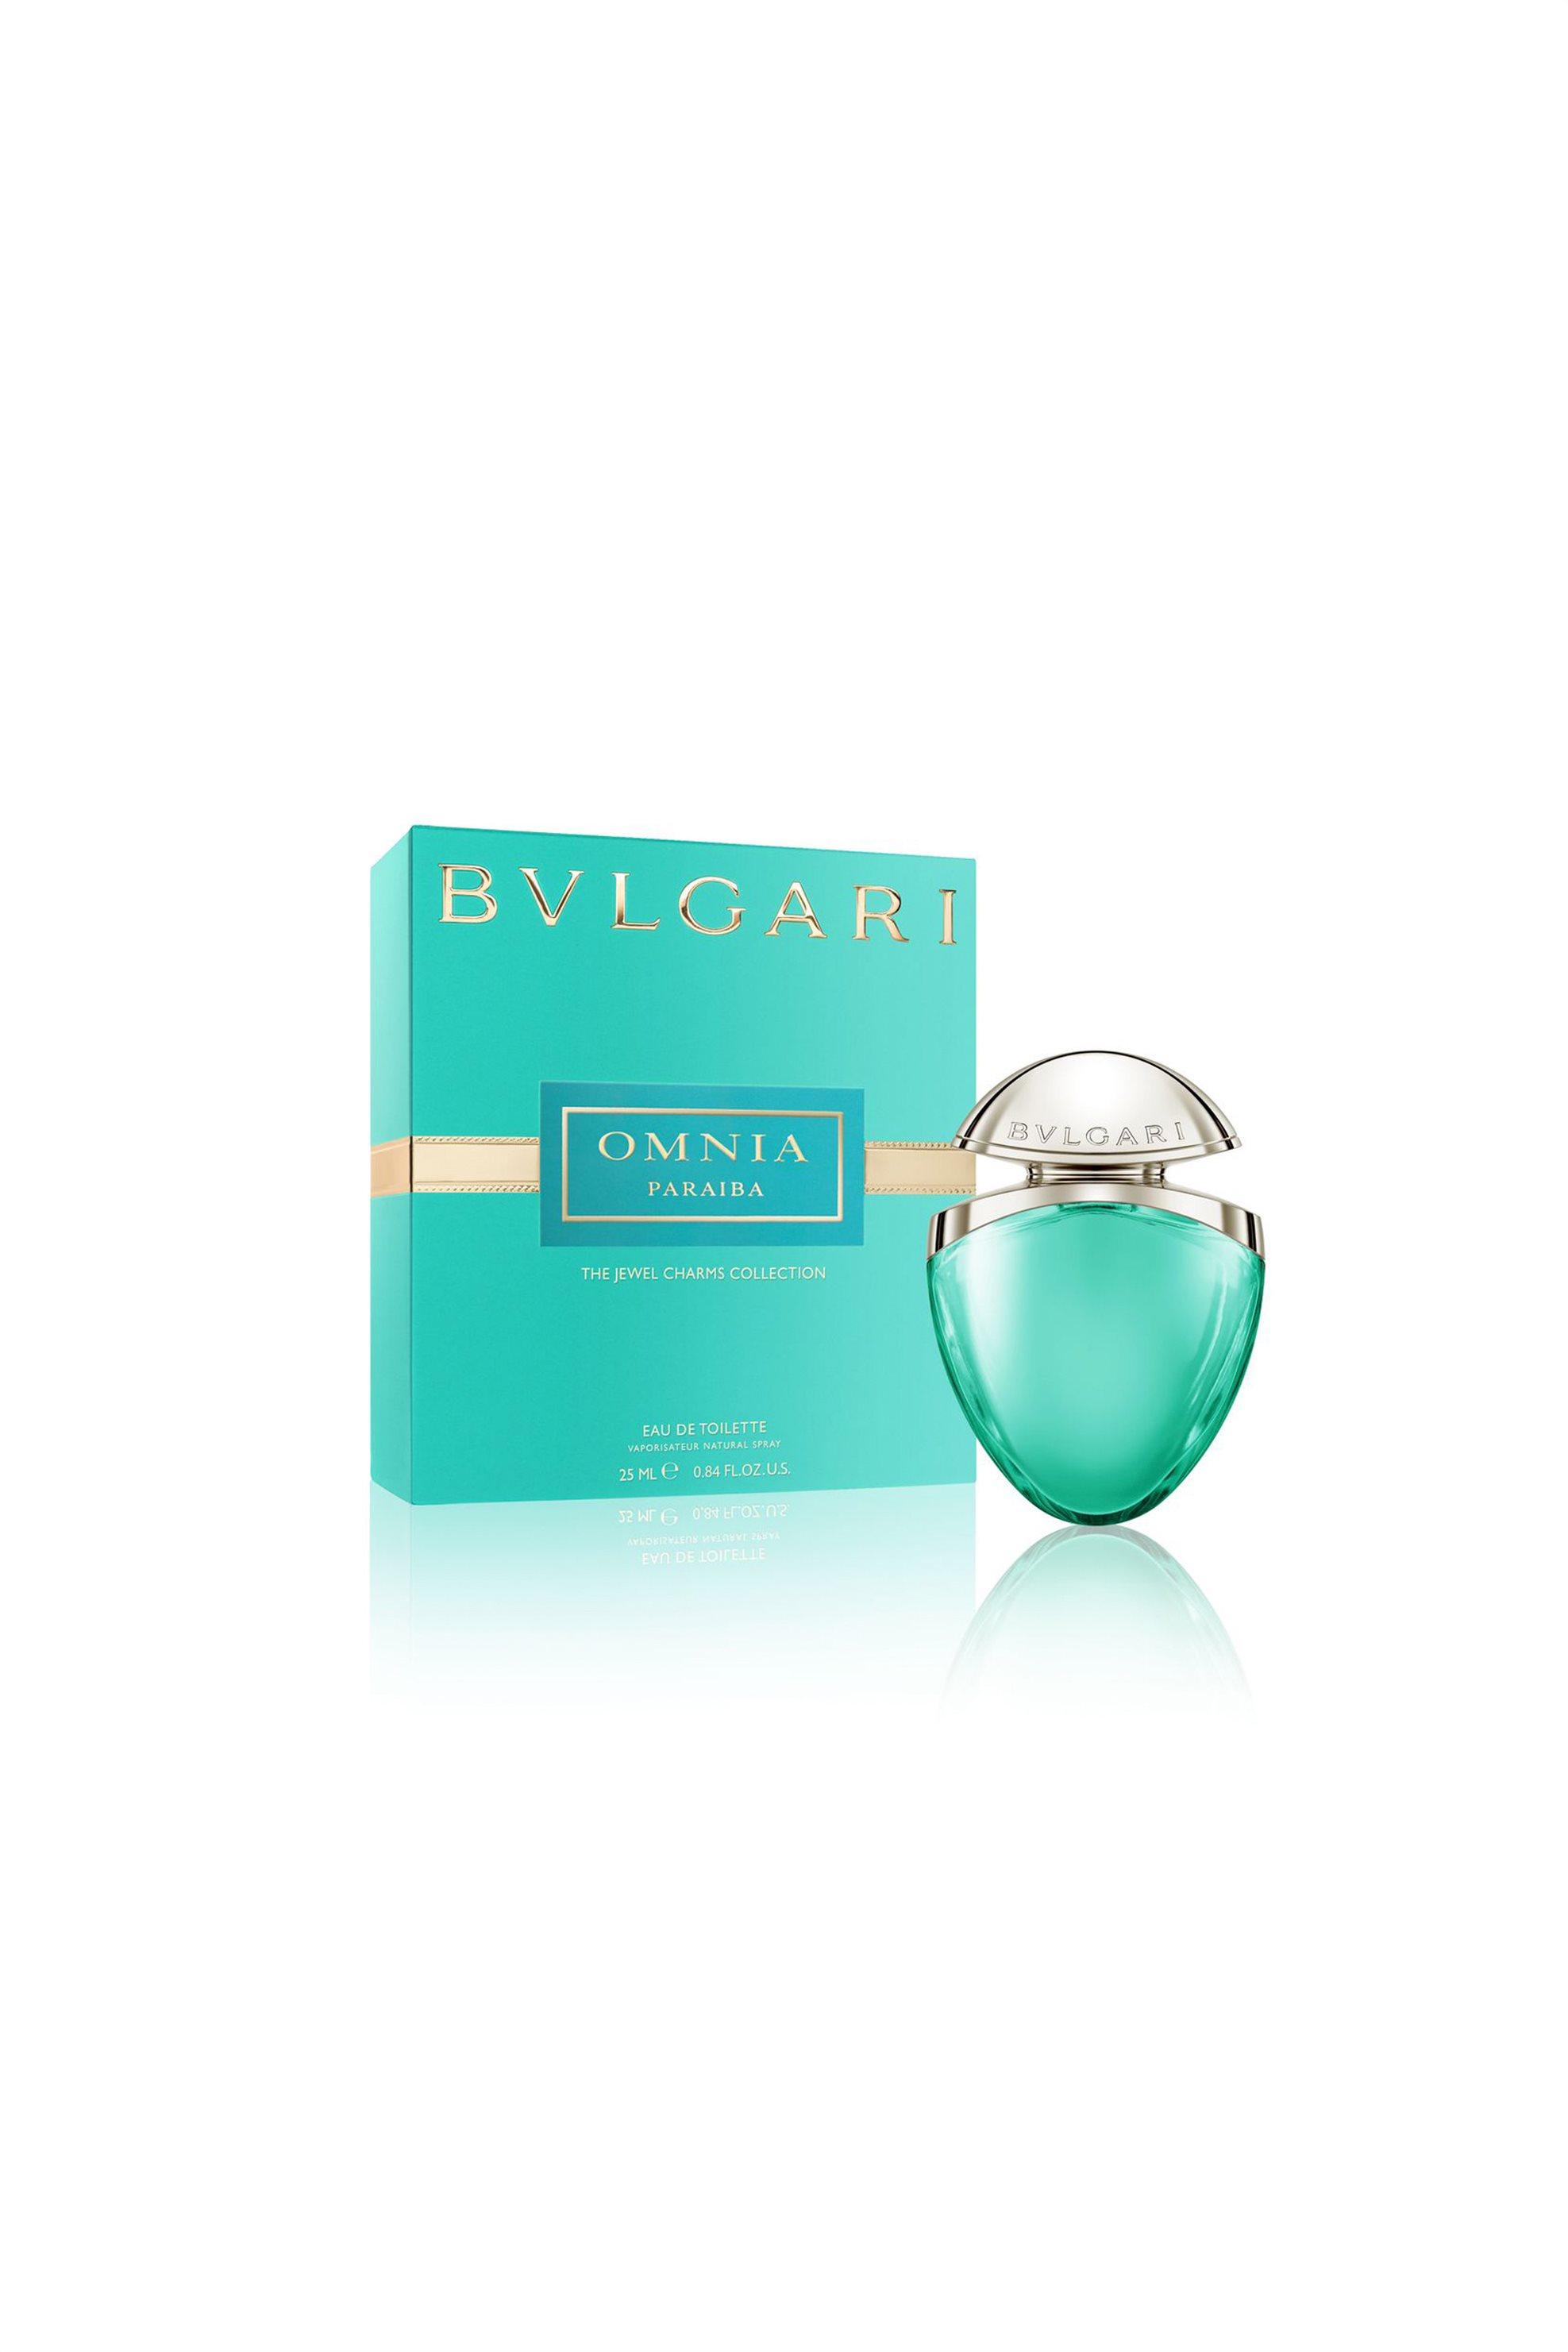 Bvlgari Omnia Paraiba EdT Jewel Charm 25 ml - 51200 ομορφια   καλλυντικα επιλεκτικησ   αρώματα   γυναικεία αρώματα   eau de toilette